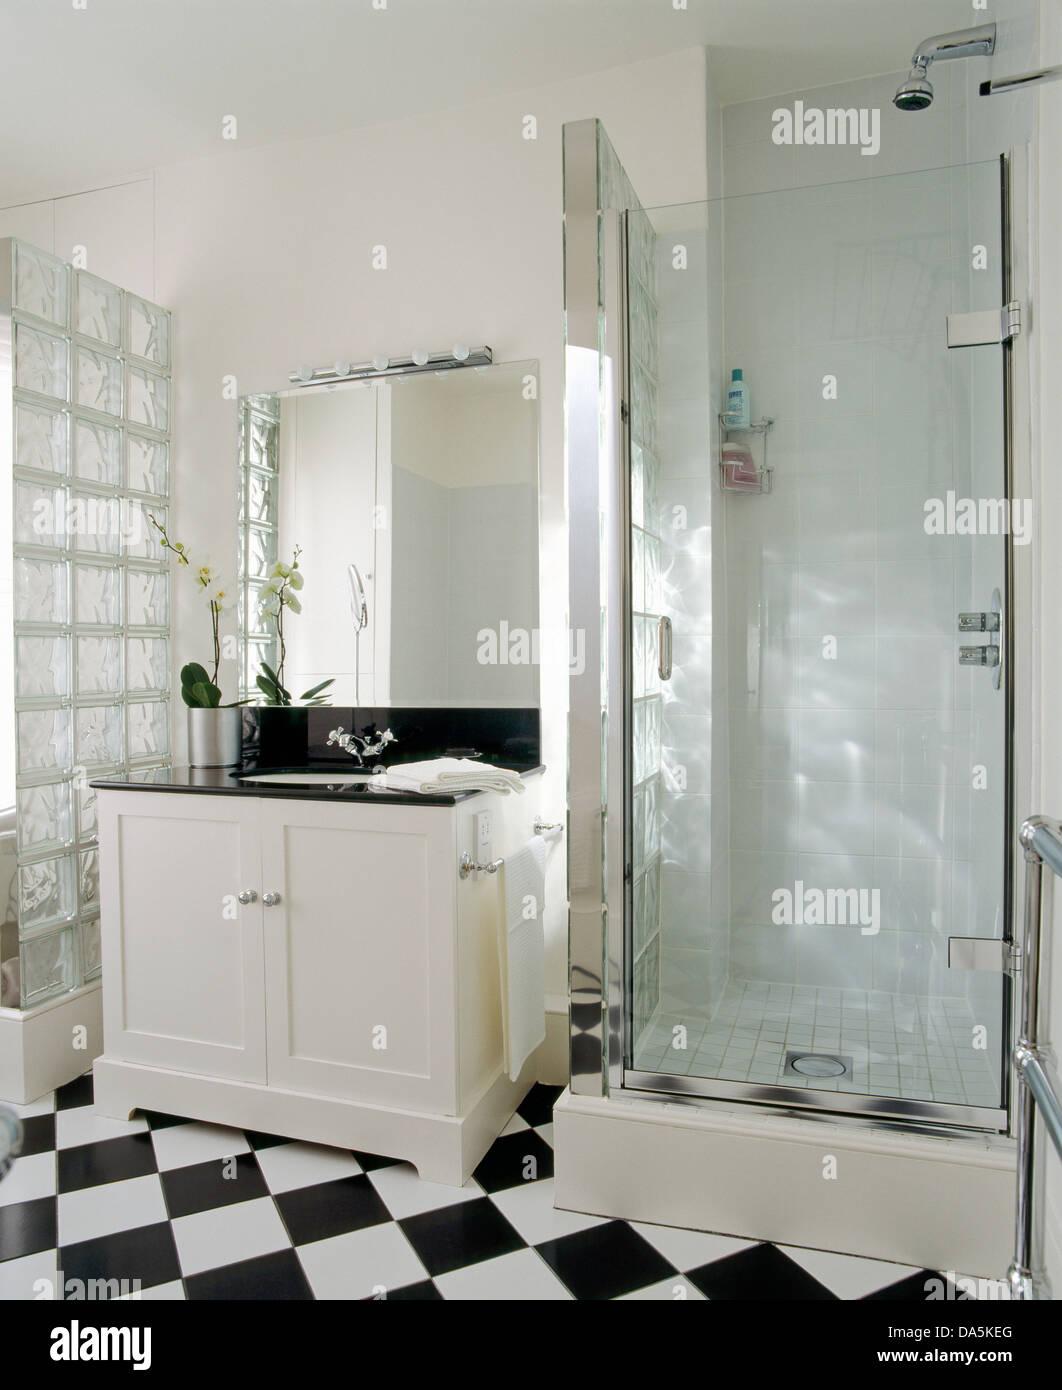 Mirror above wash basin in white vanity unit beside glass shower cabinet in  modern bathroom with black white checkerboard floor. Mirror above wash basin in white vanity unit beside glass shower